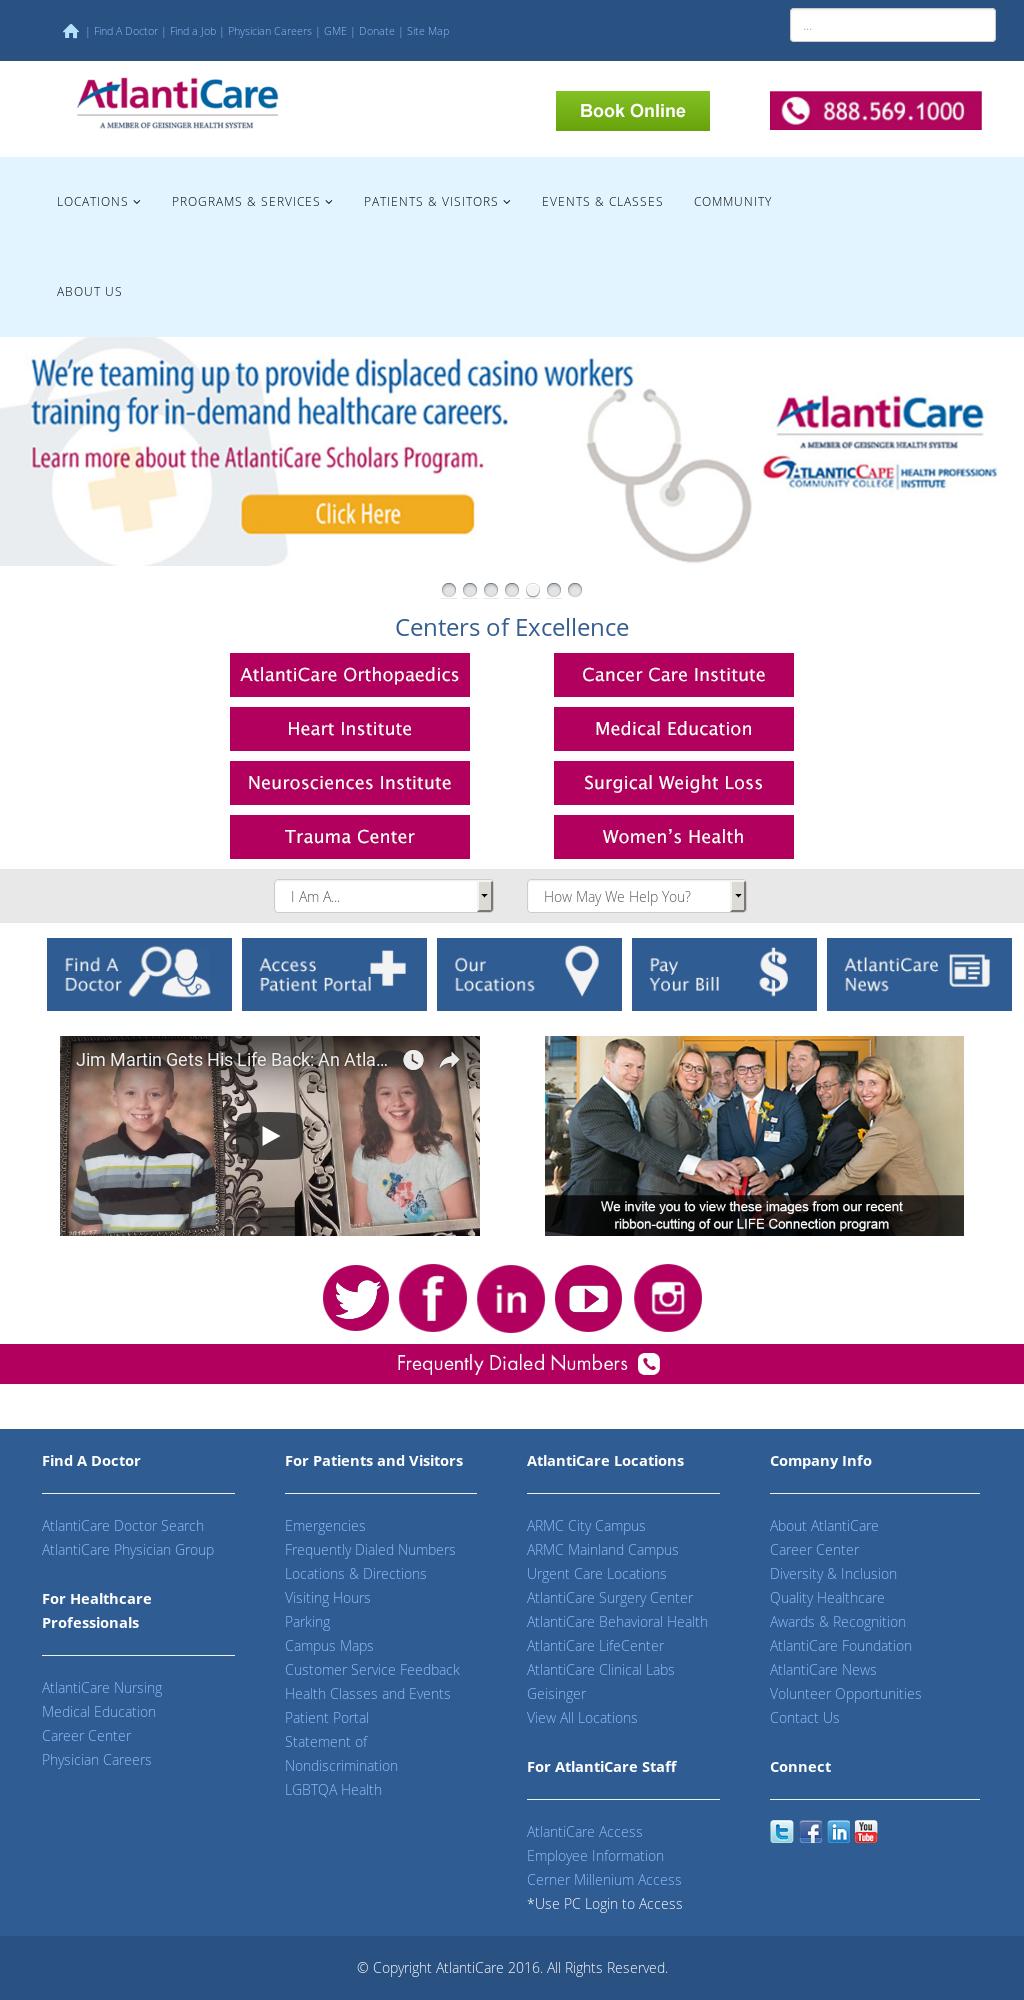 AtlantiCare Competitors, Revenue and Employees - Owler